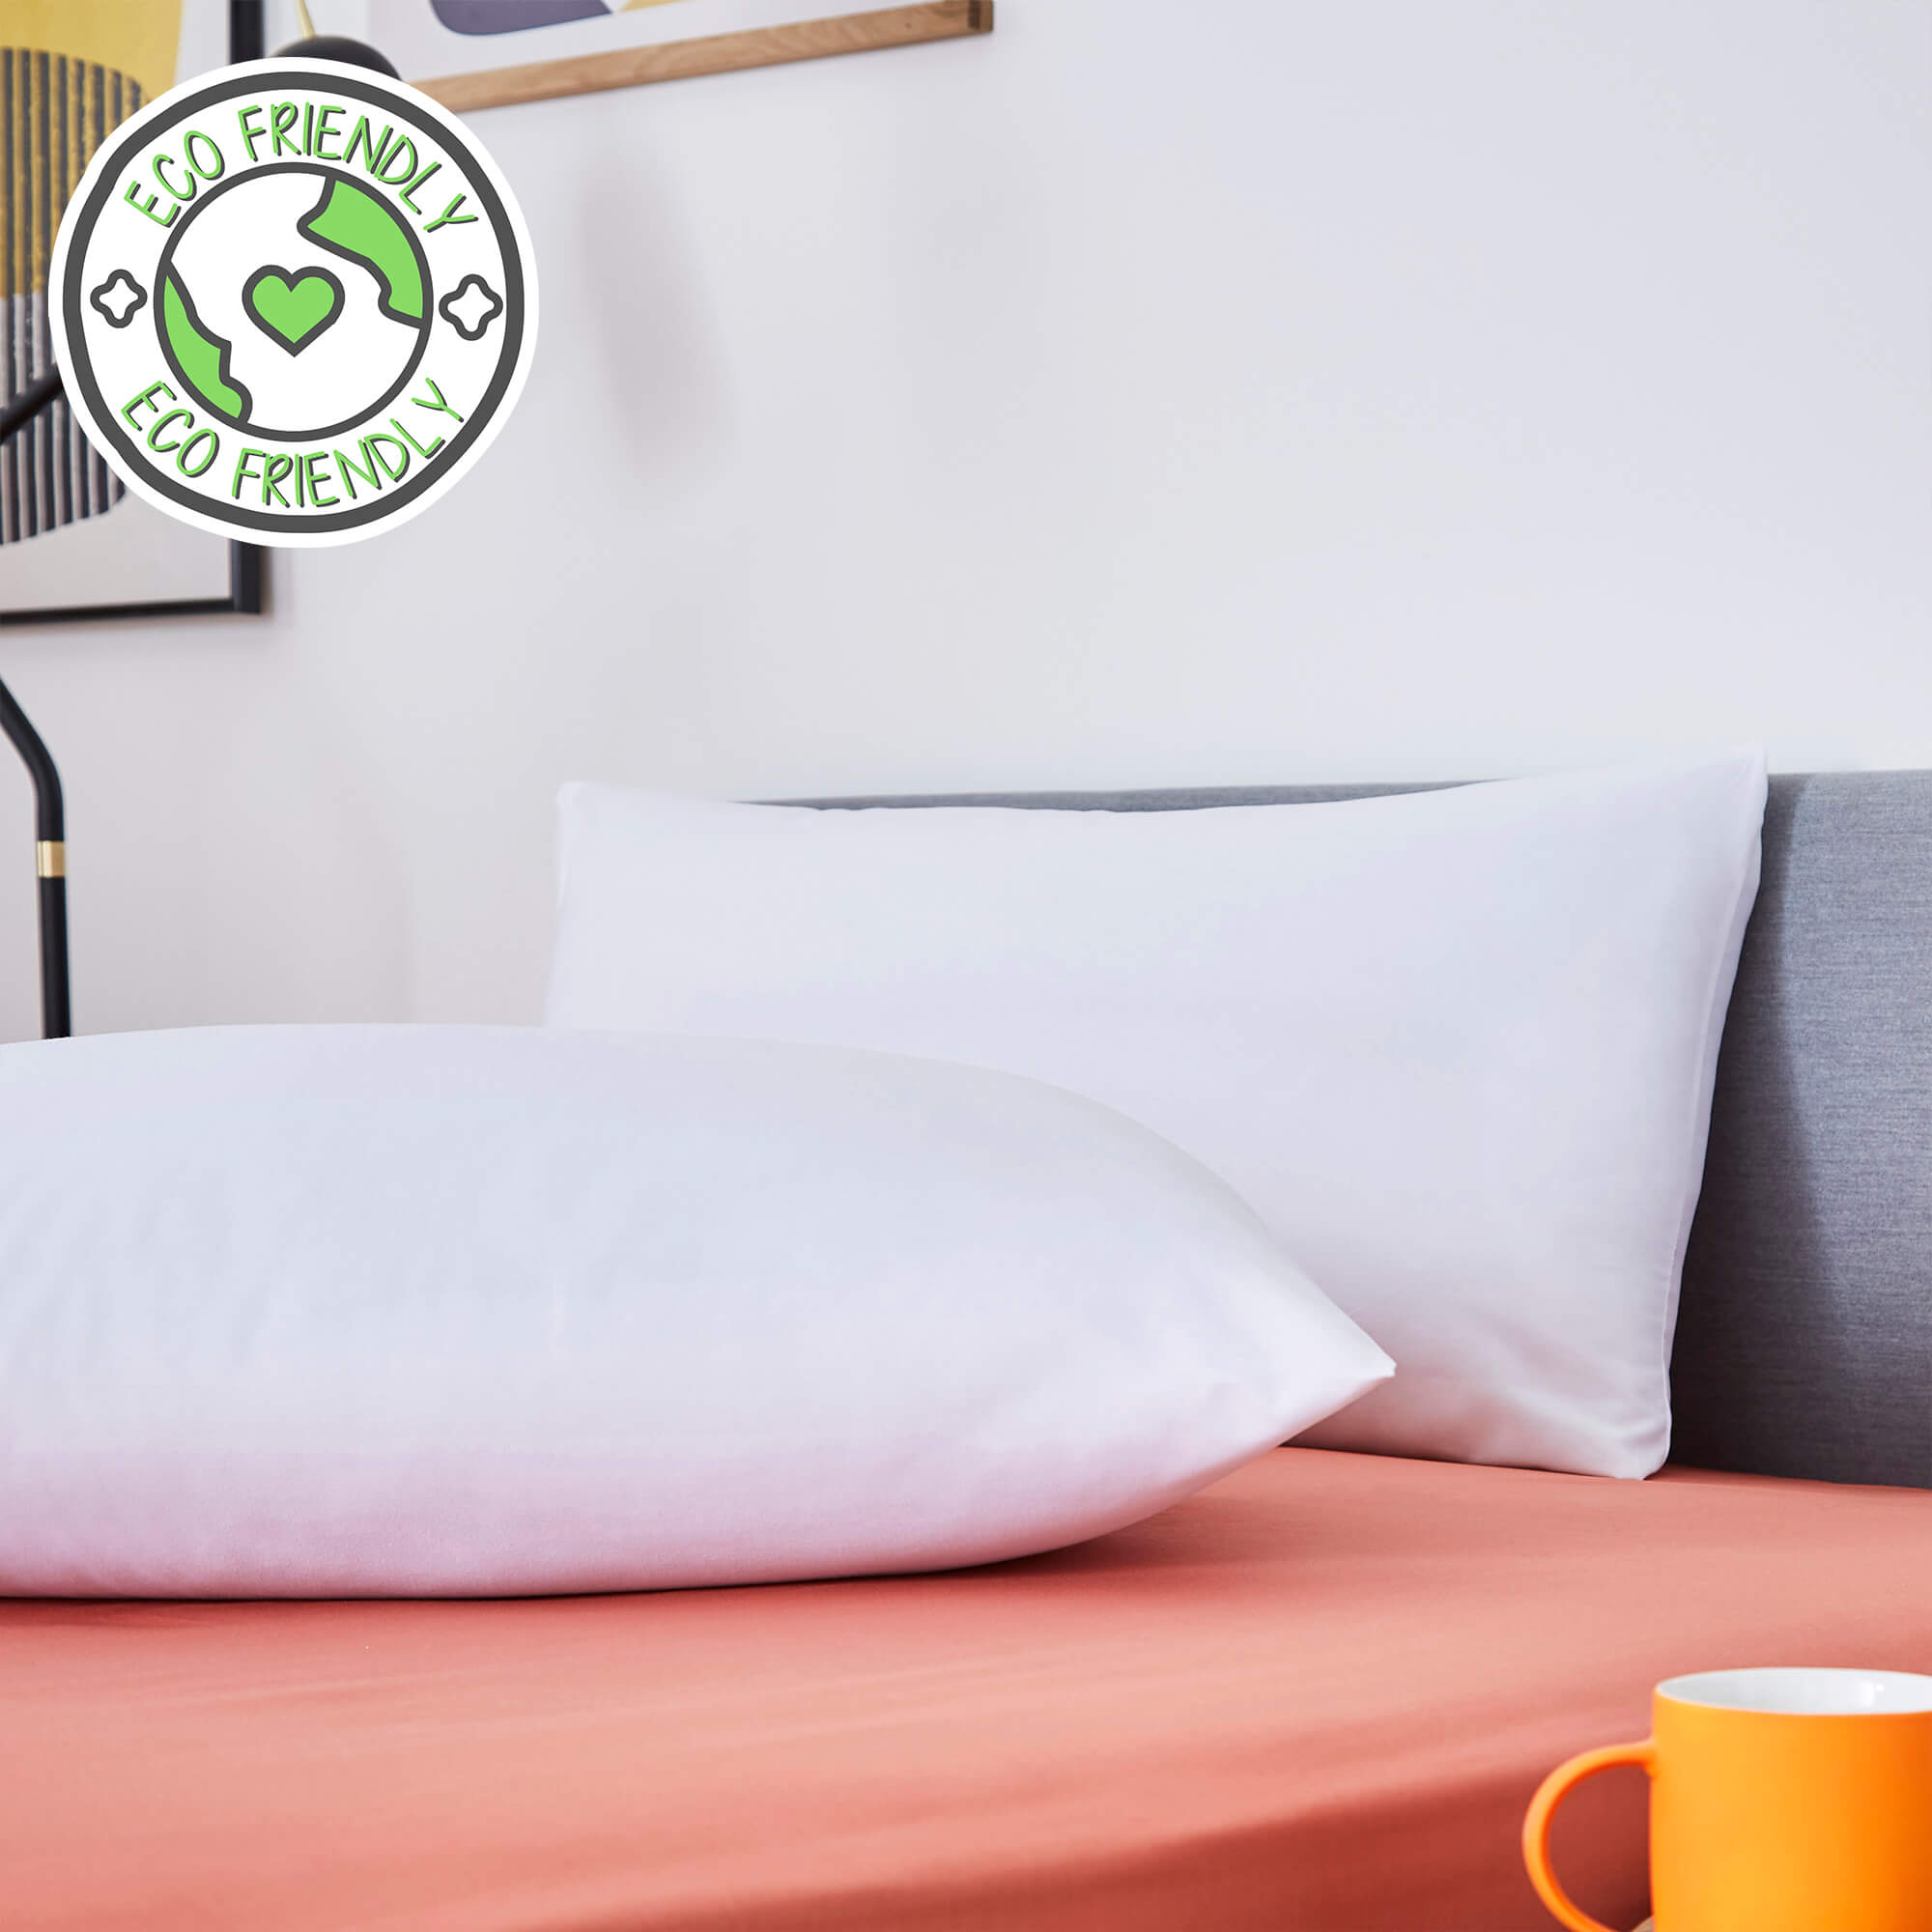 Snug Snuggle Up Pillows – 2 pack